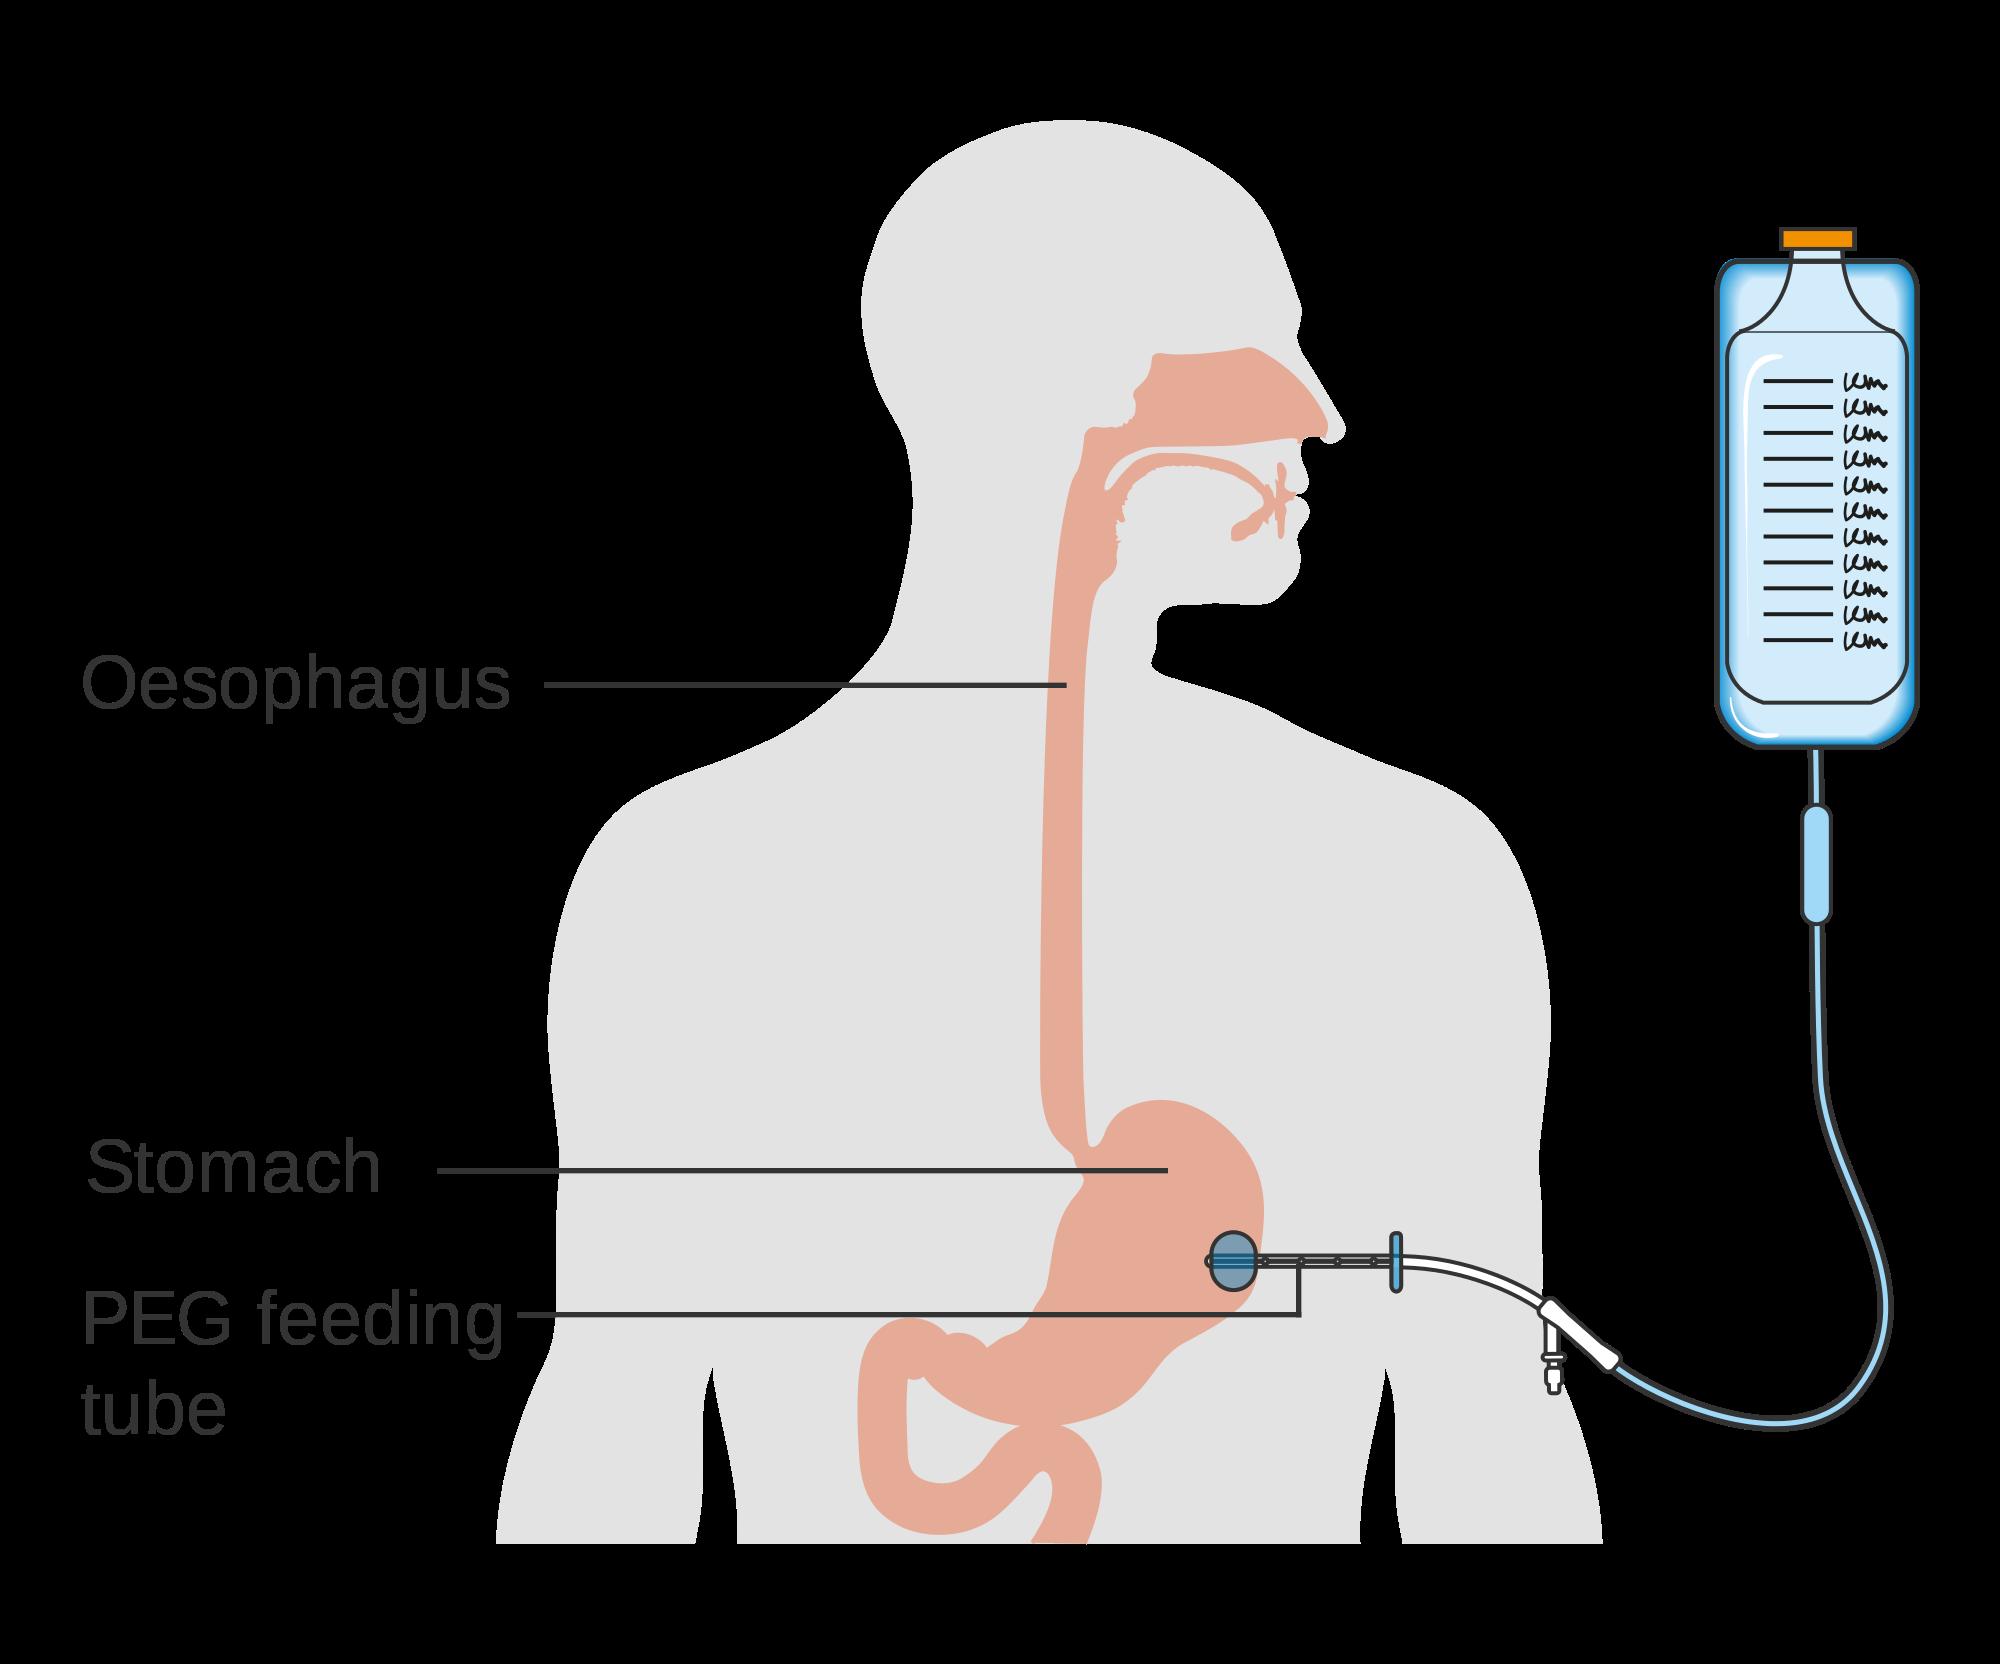 graphic Vector bundles endoscope. File diagram showing the